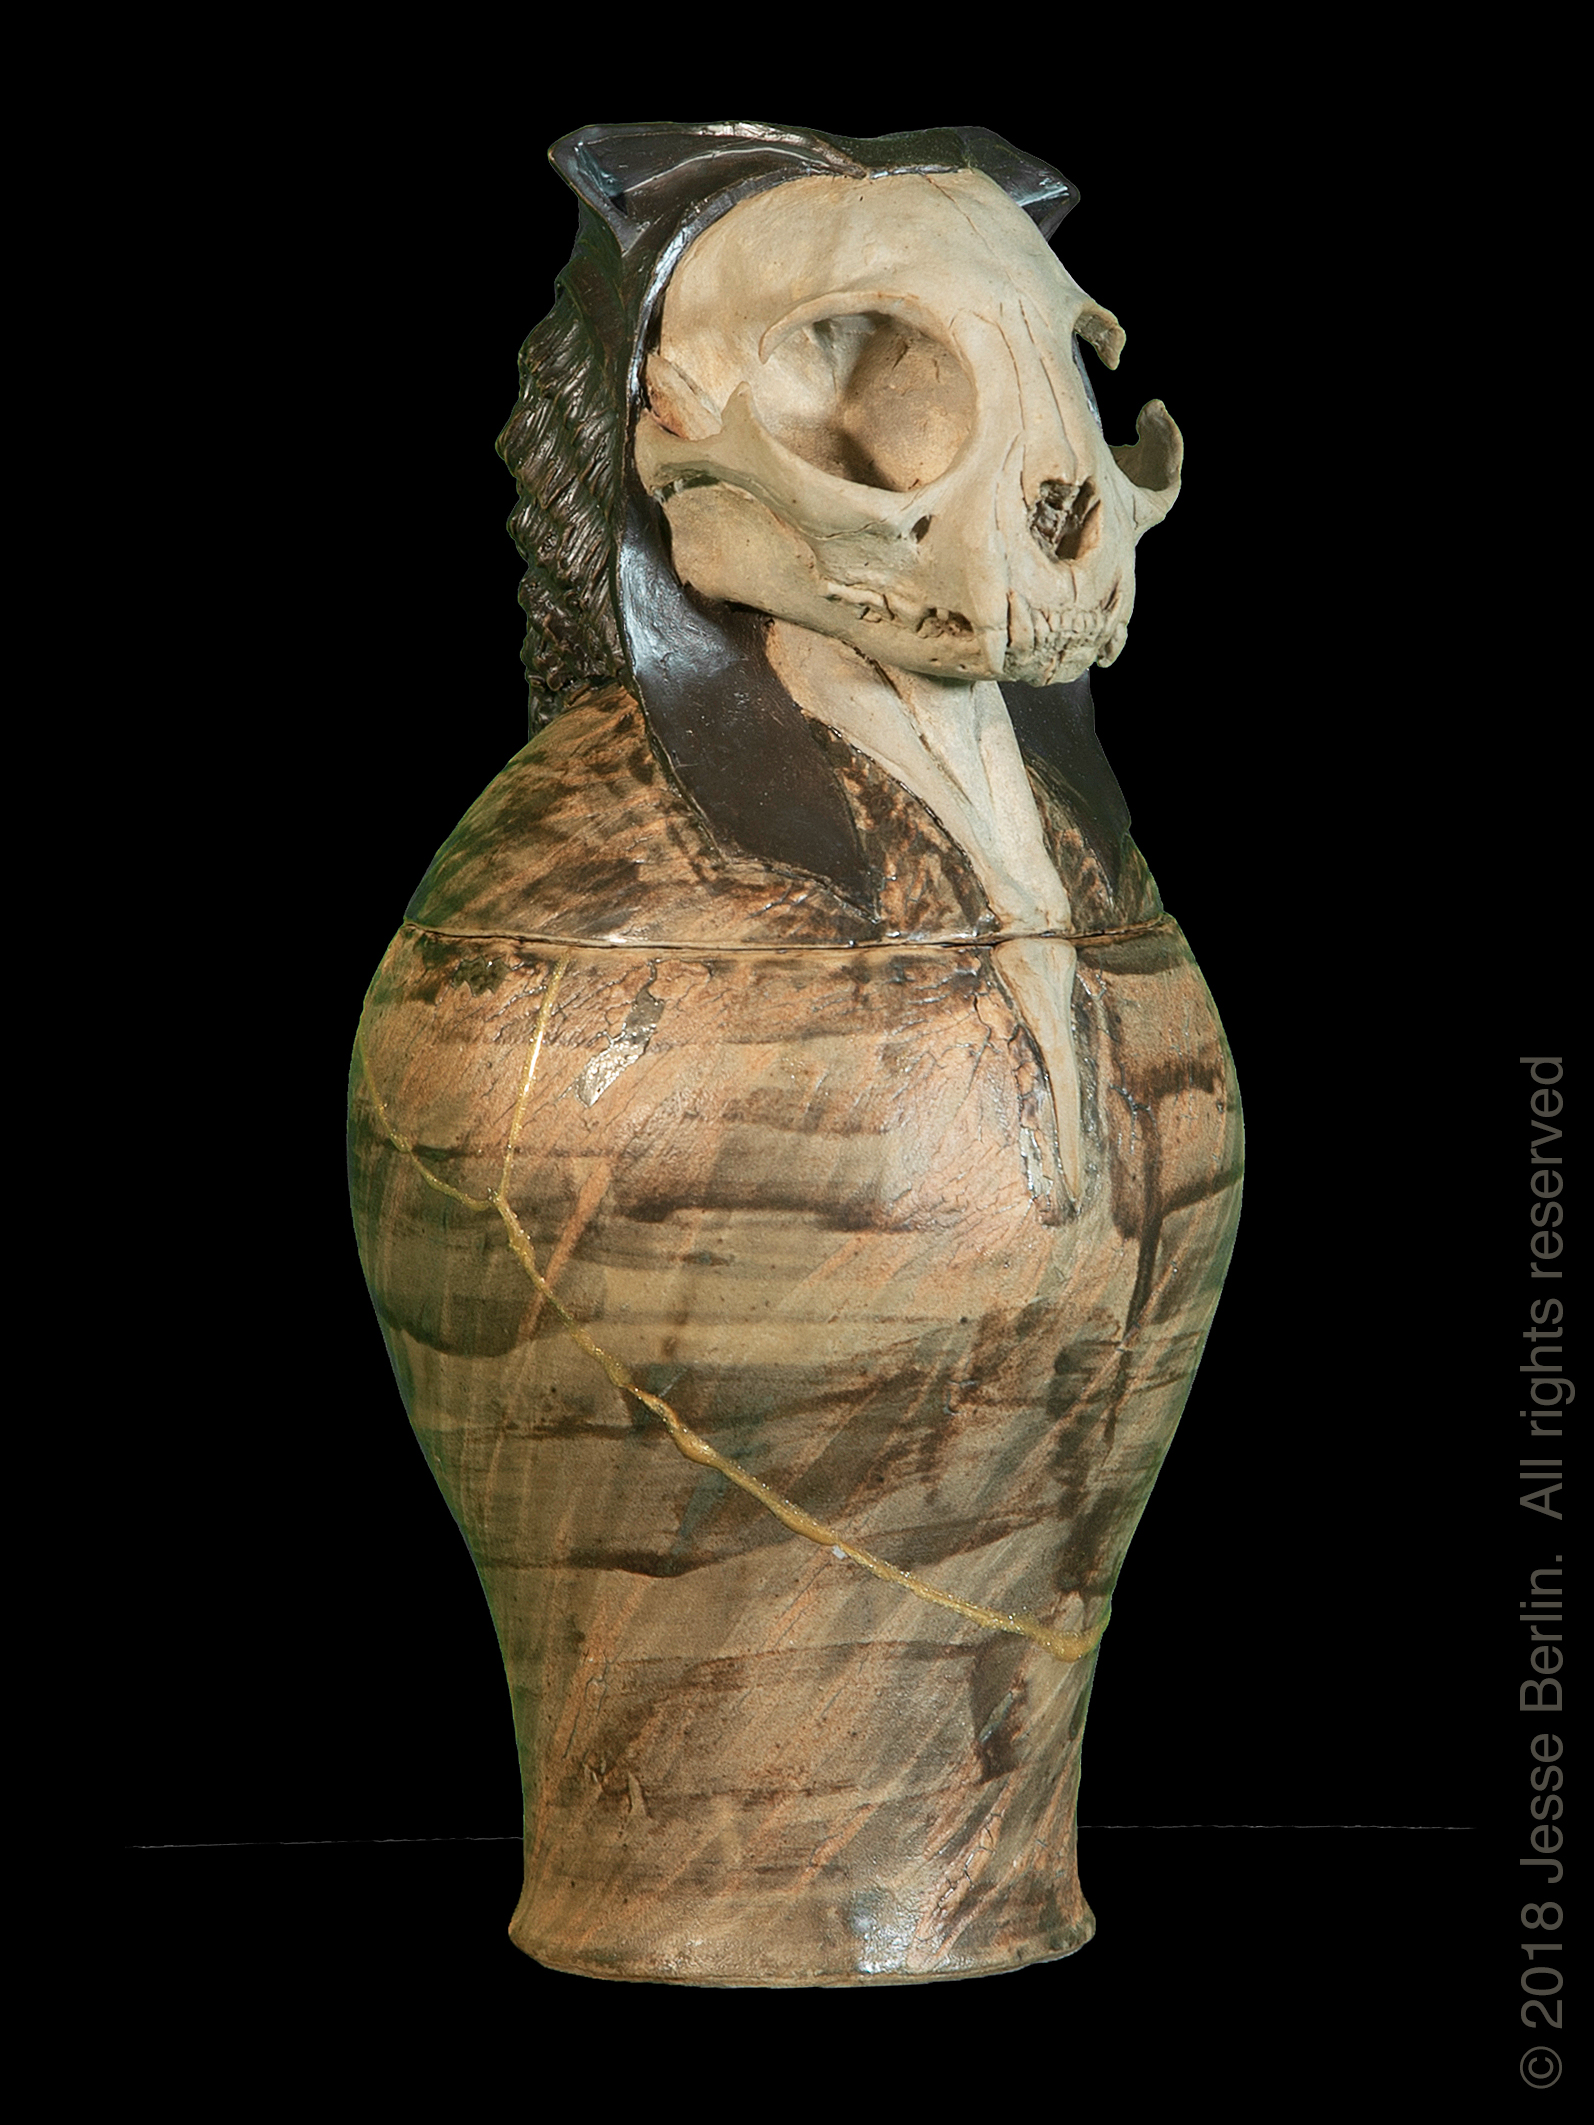 Bast 3 Canopic Jar/Funerary Urn